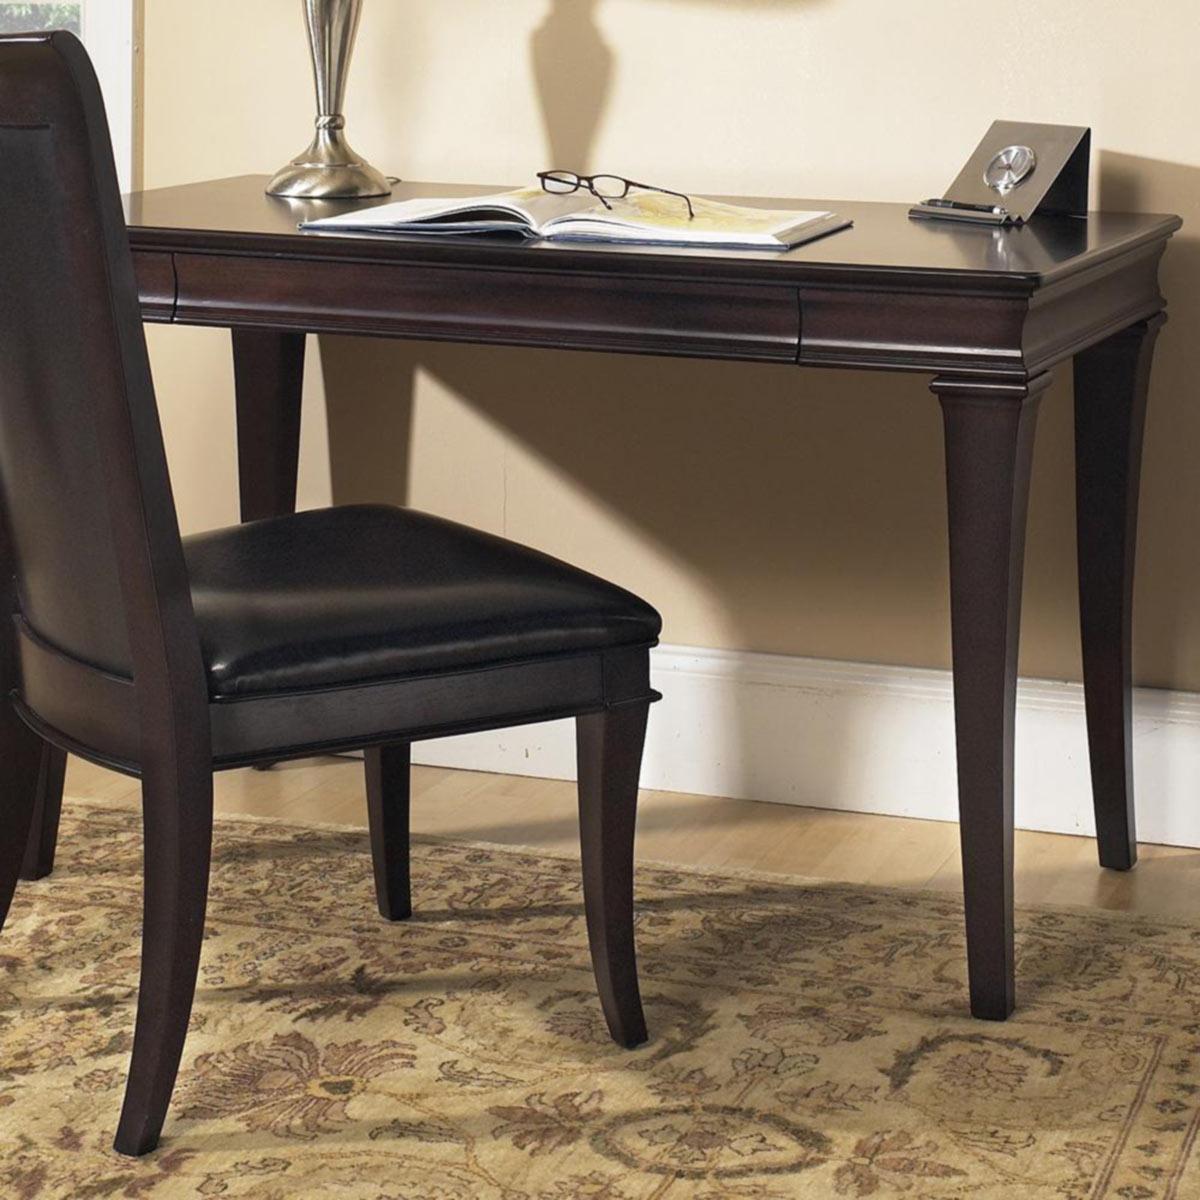 pulaski writing desk Browse pulaski furniture at raymour and flanigan to furnish your home.